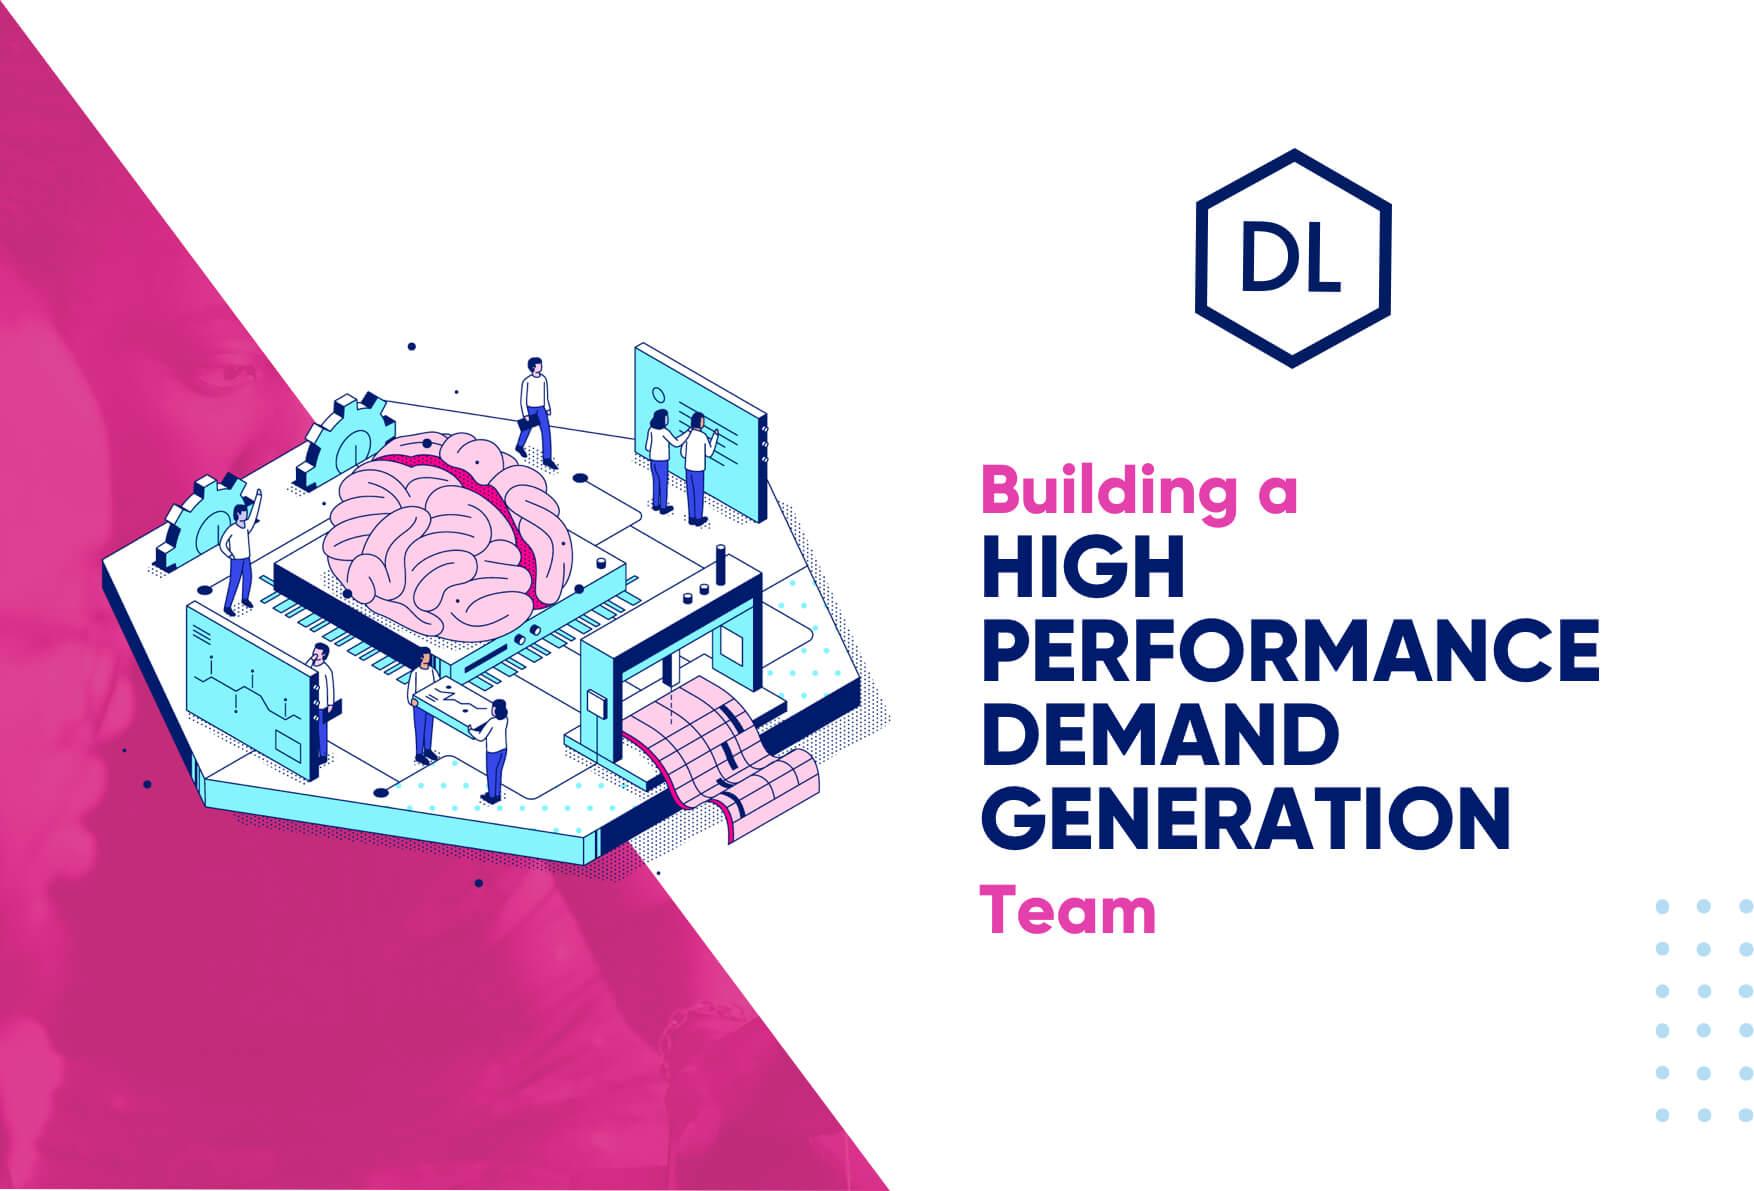 Building a High Performance Demand Generation Team